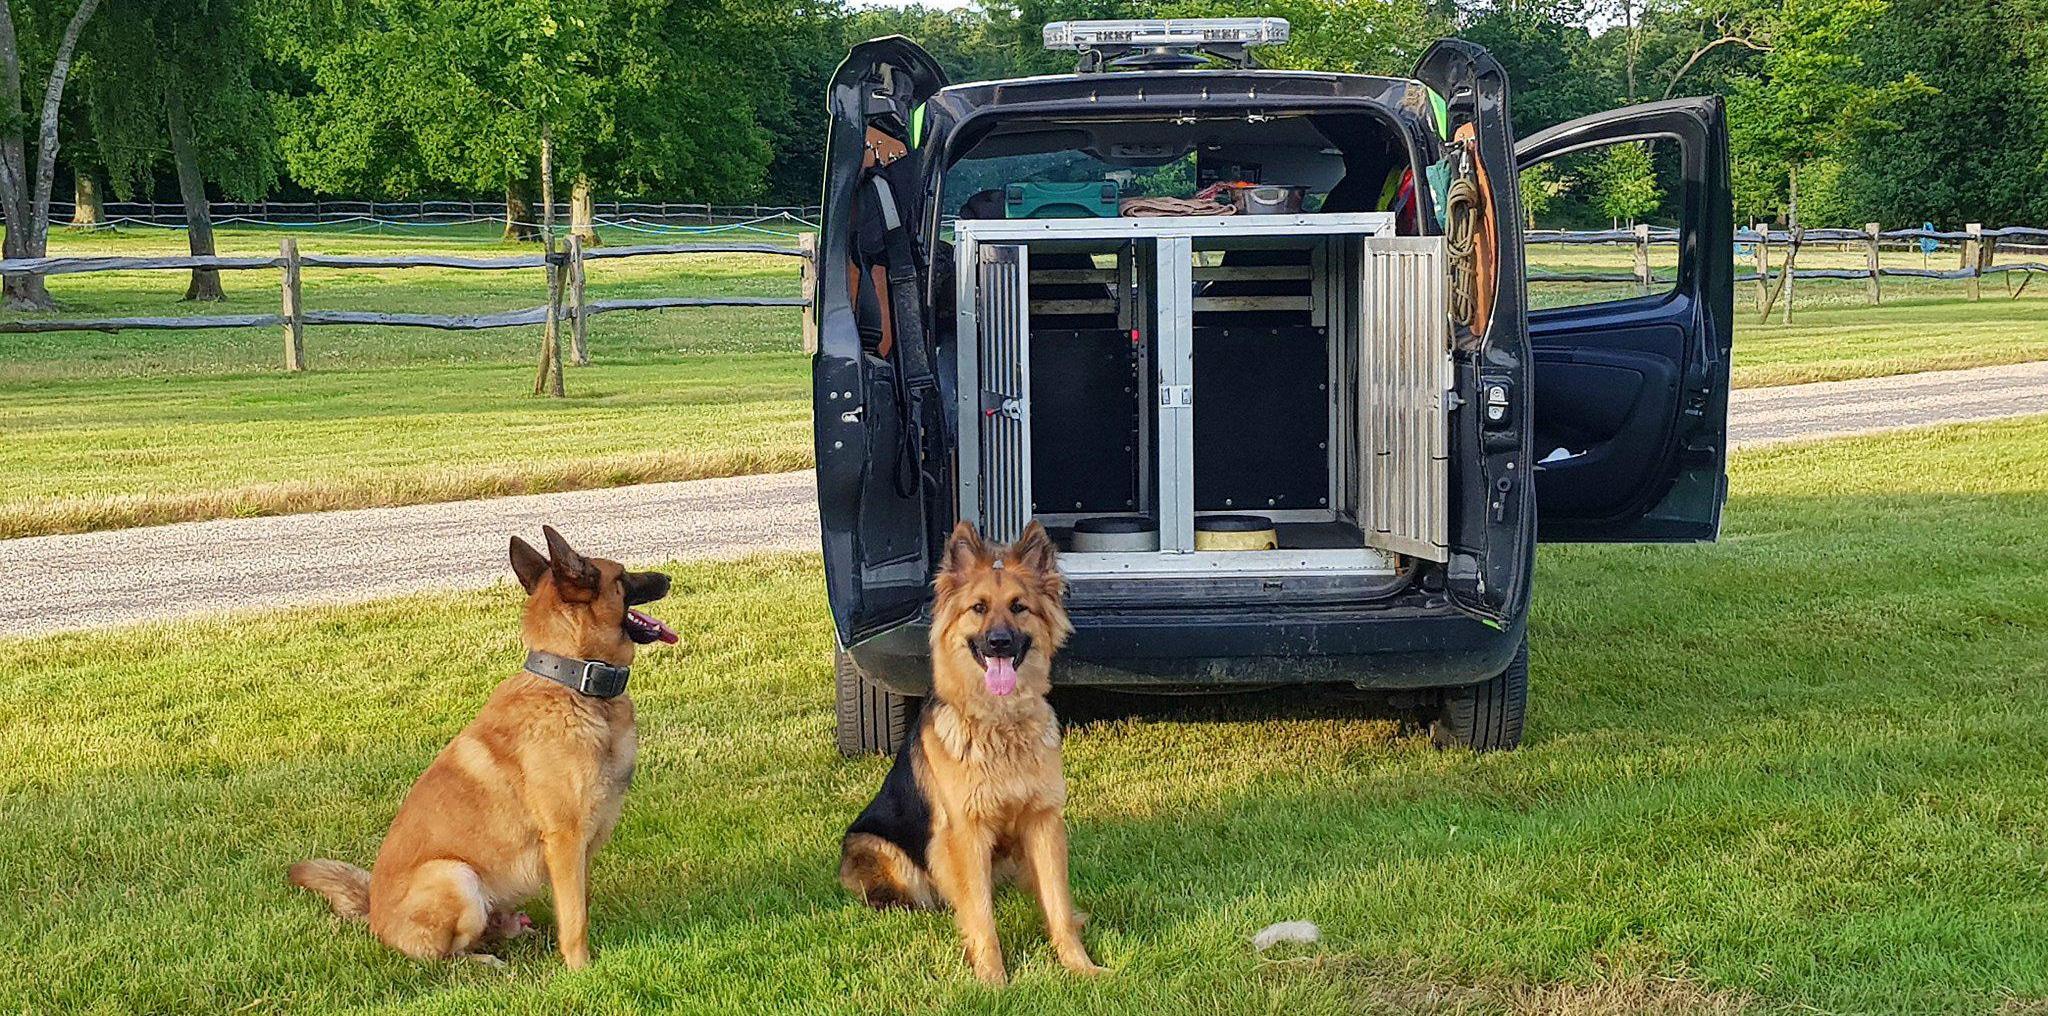 Security dog unit